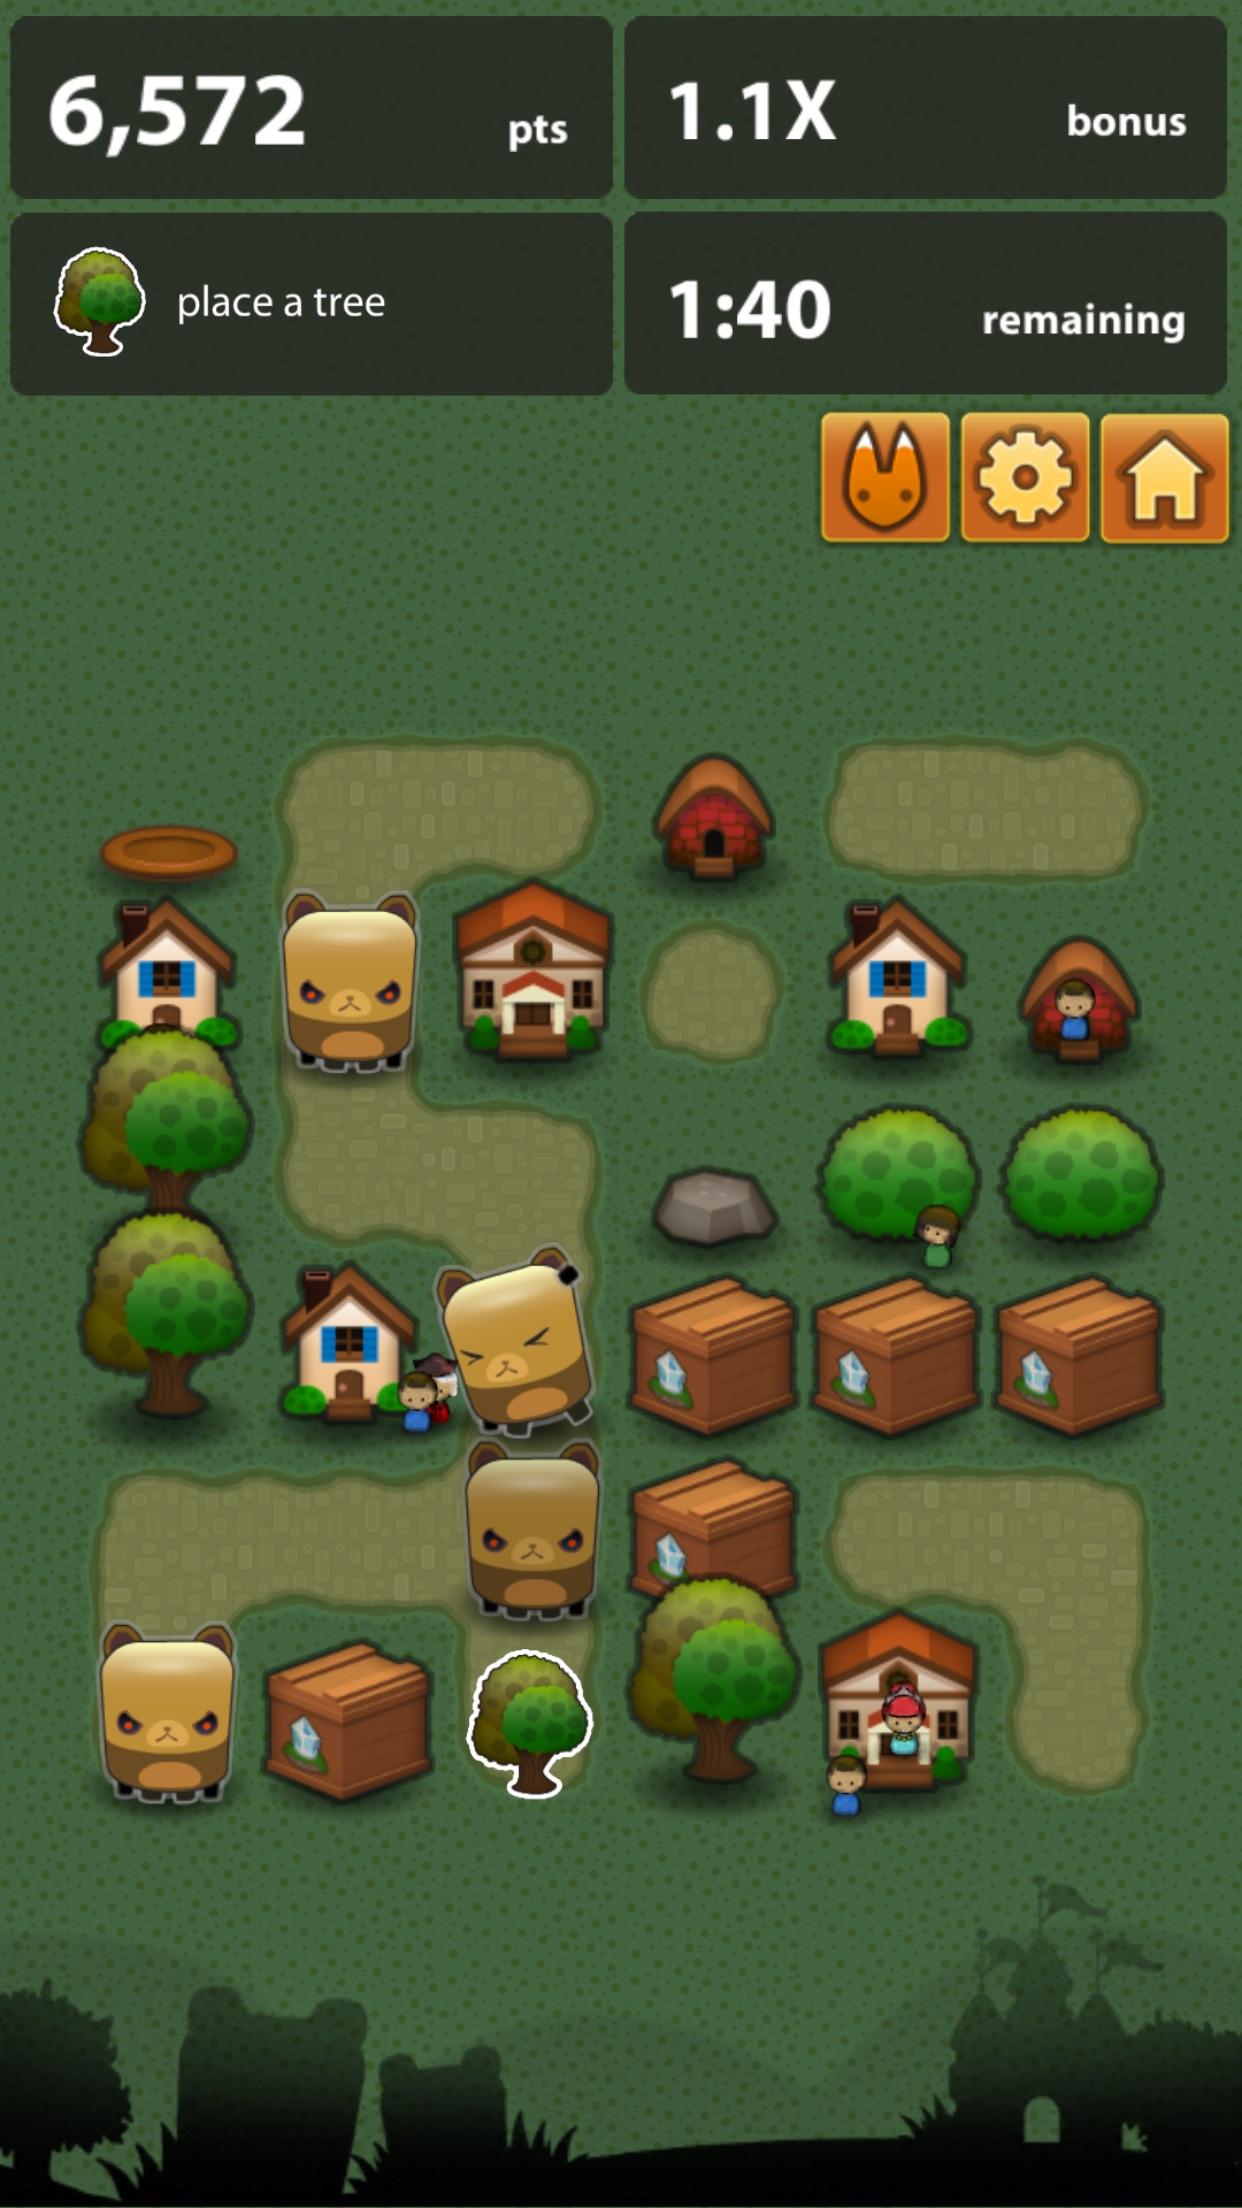 Triple Town - Fun & addictive puzzle matching game Screenshot